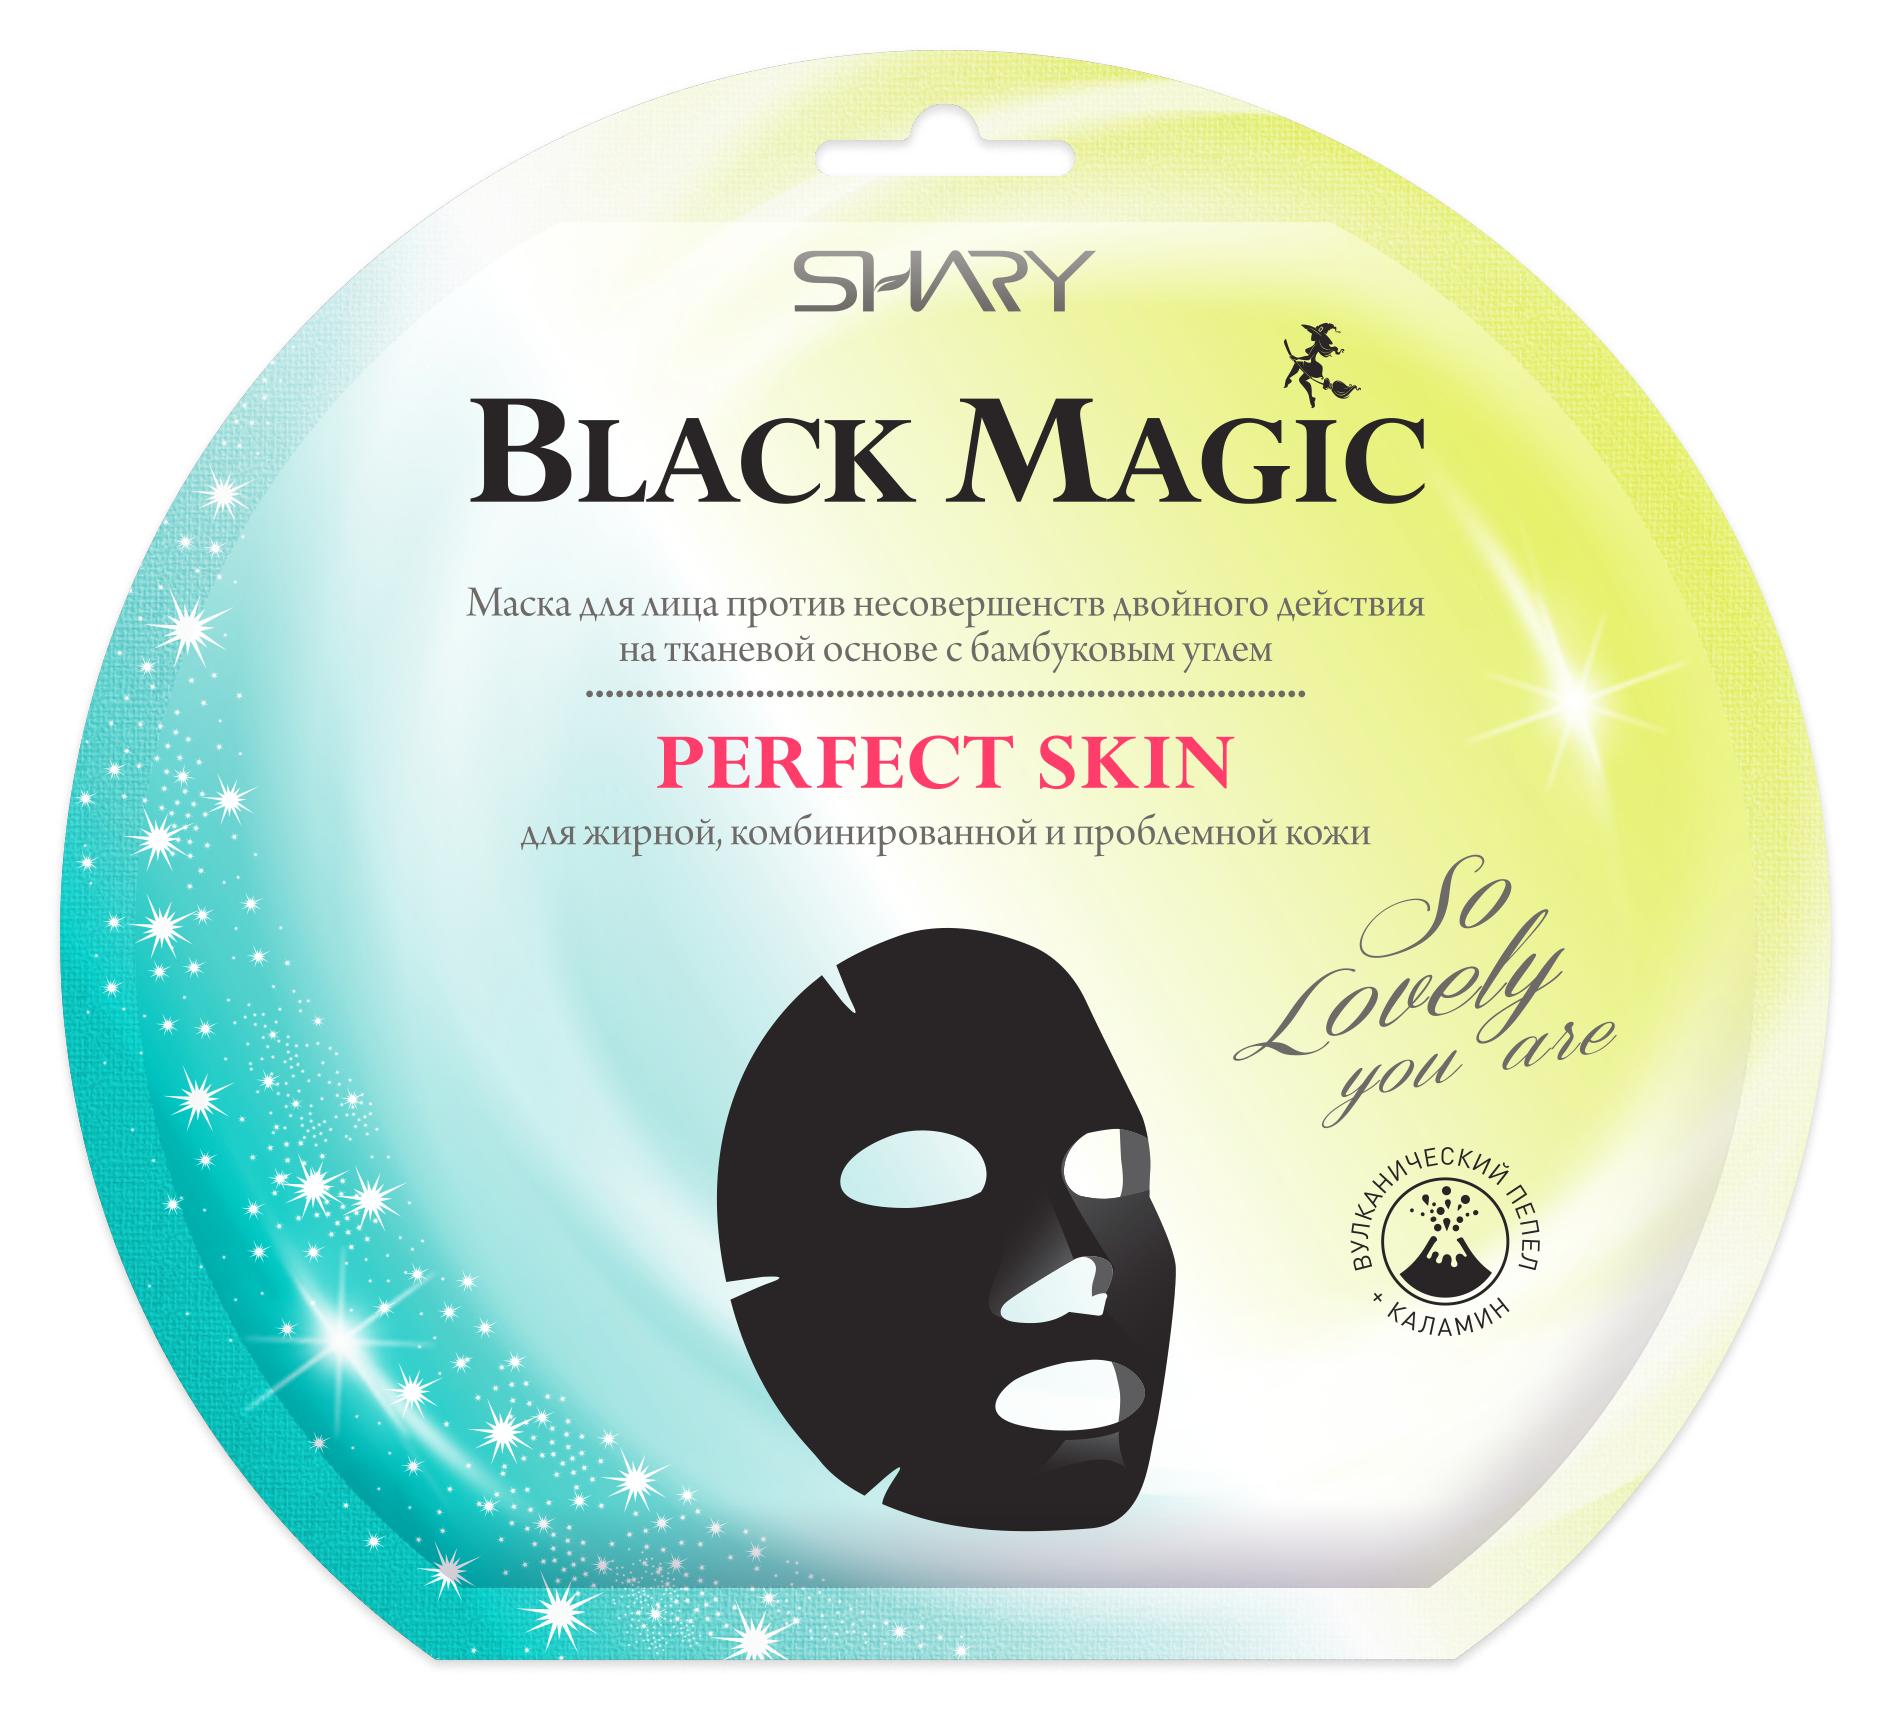 SHARY Маска для лица против несовершенств / Shary Black magic PERFECT SKIN, 20 г